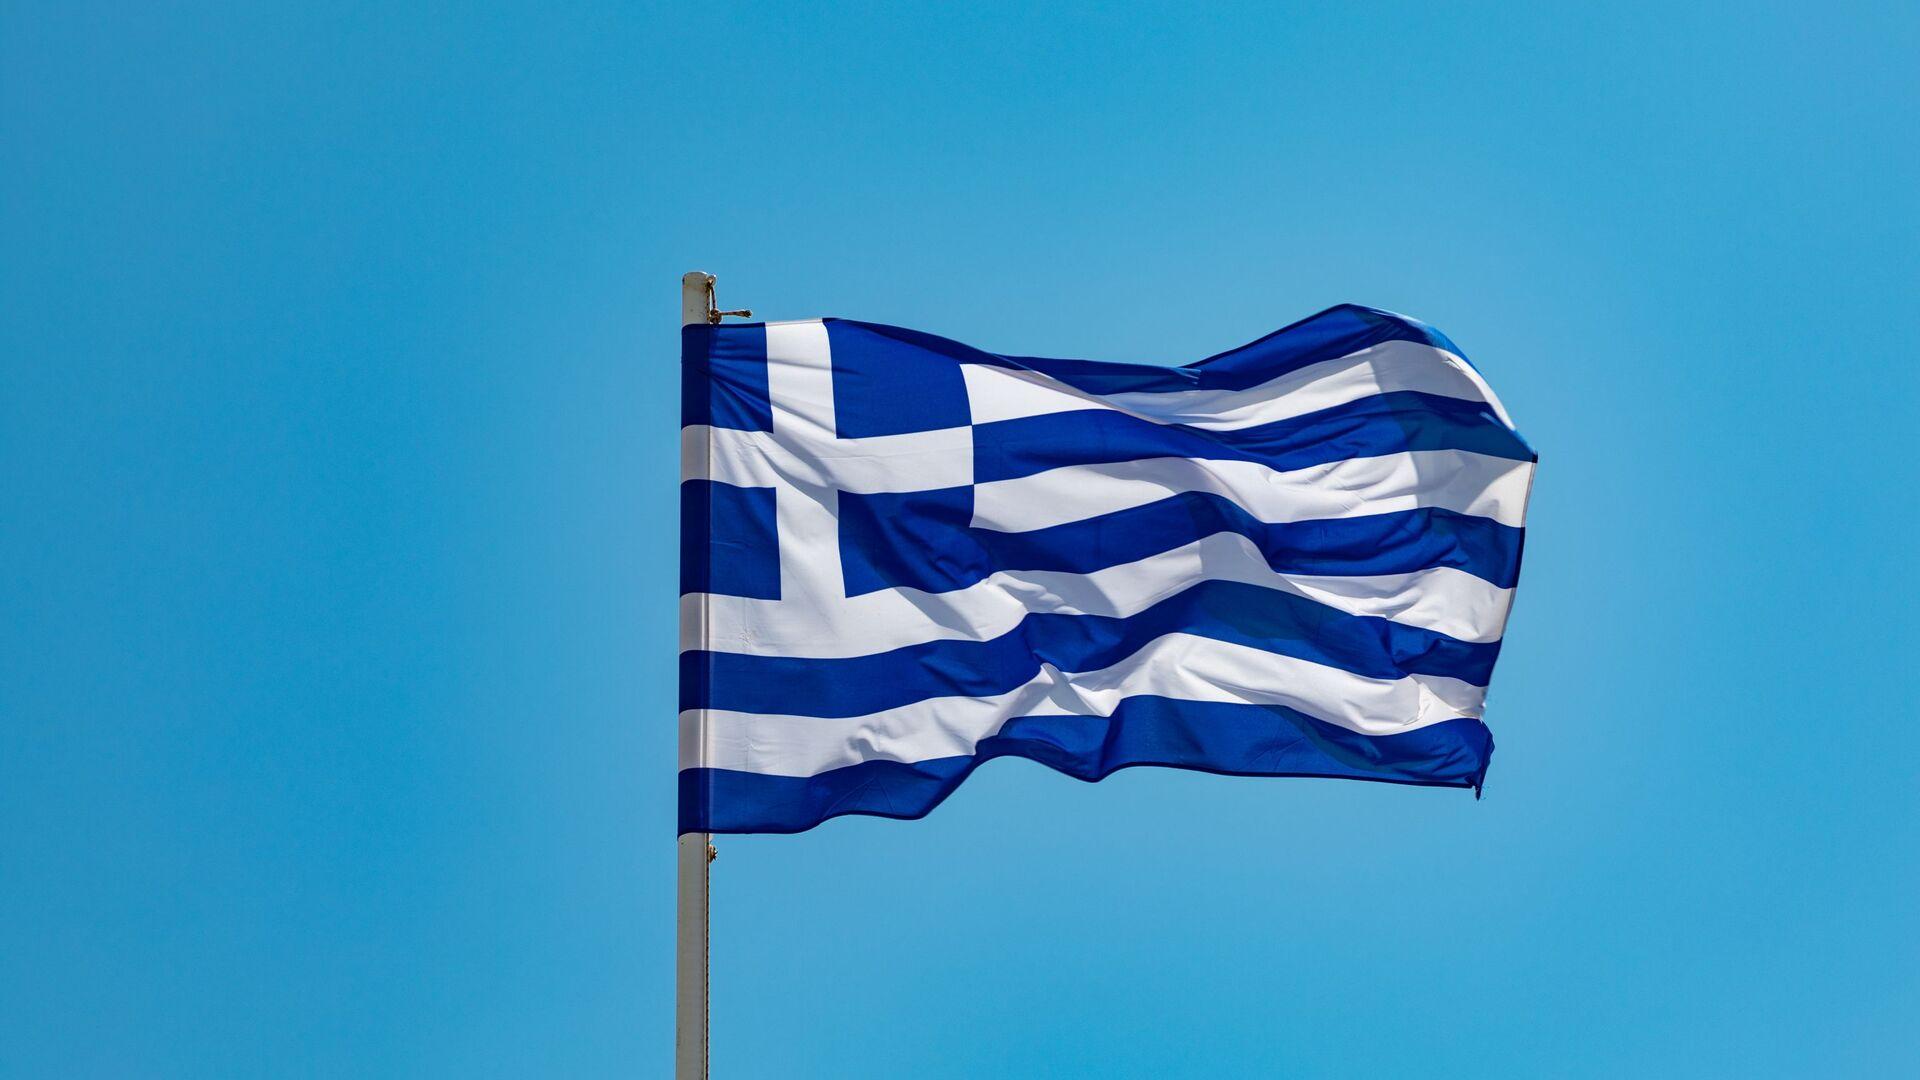 Una bandera de Grecia - Sputnik Mundo, 1920, 04.02.2021